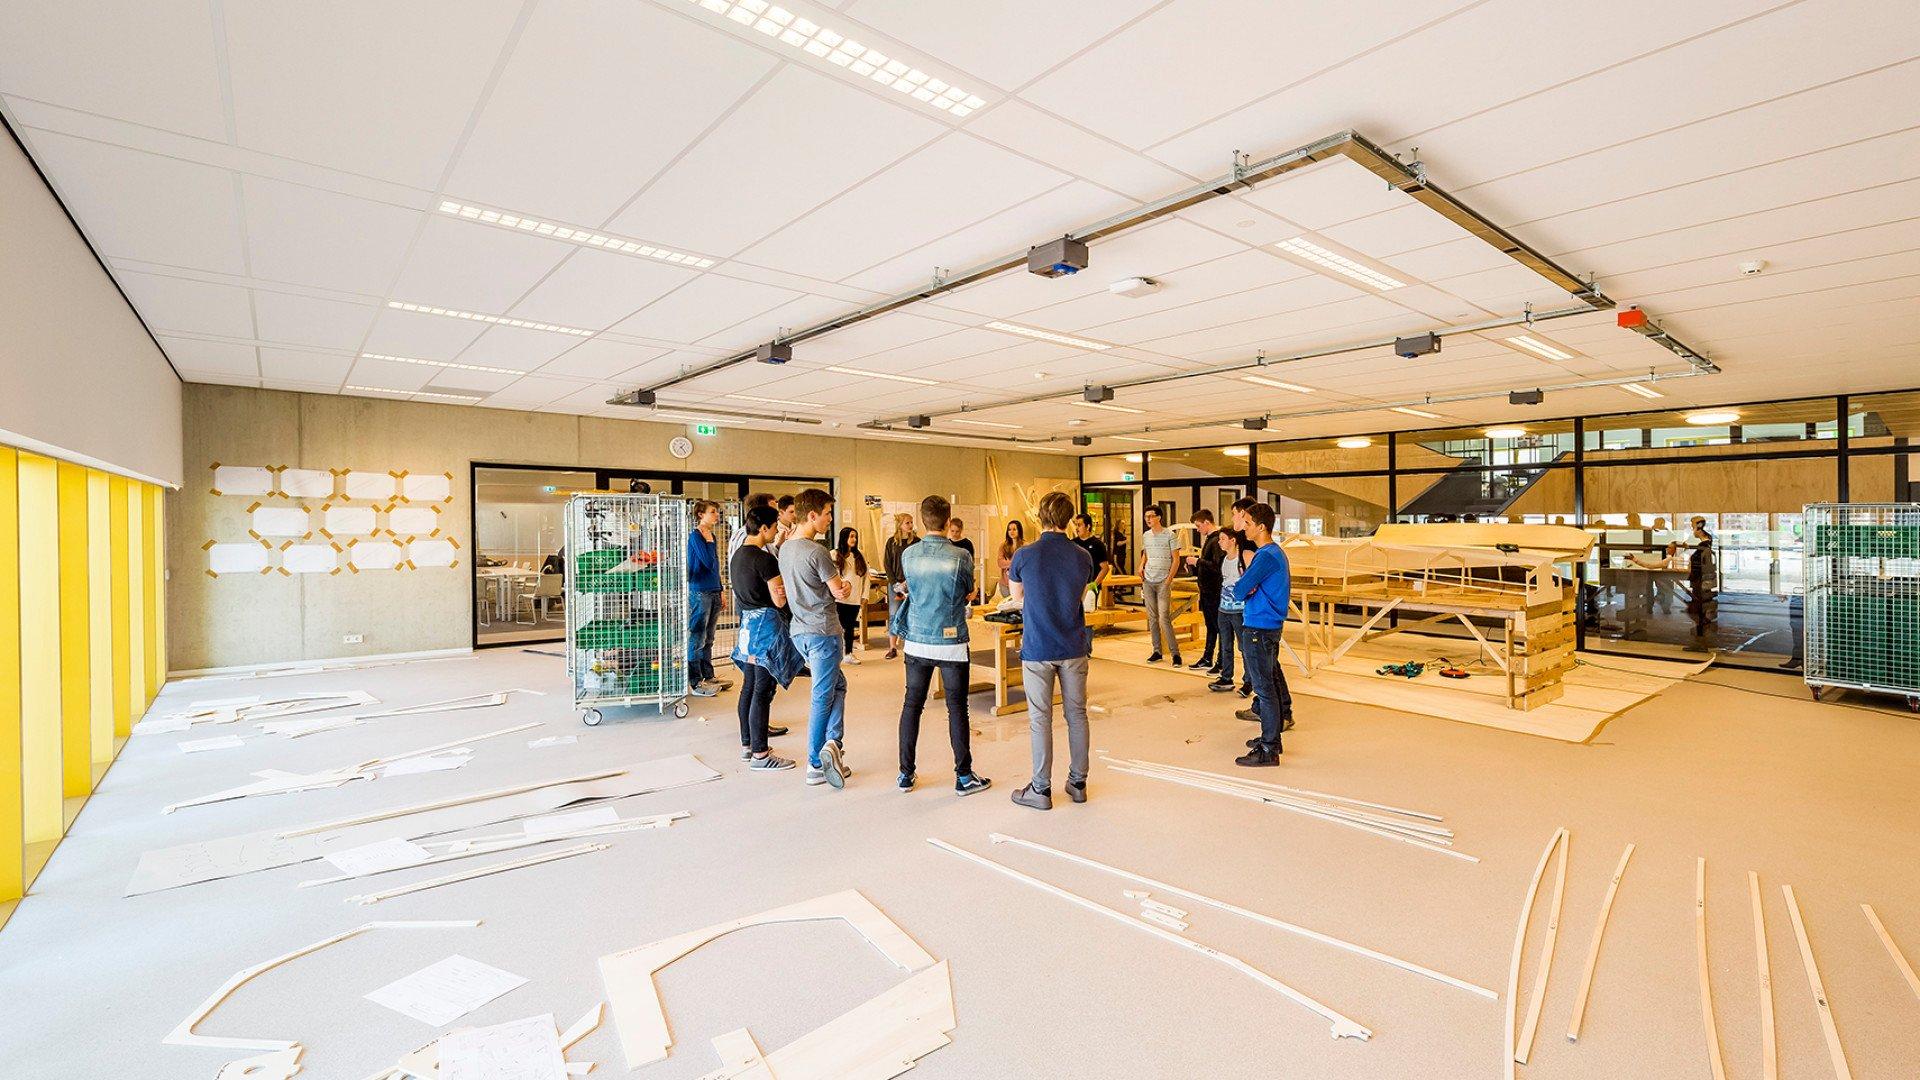 IJburg College Amsterdam Bolidtop 700 College